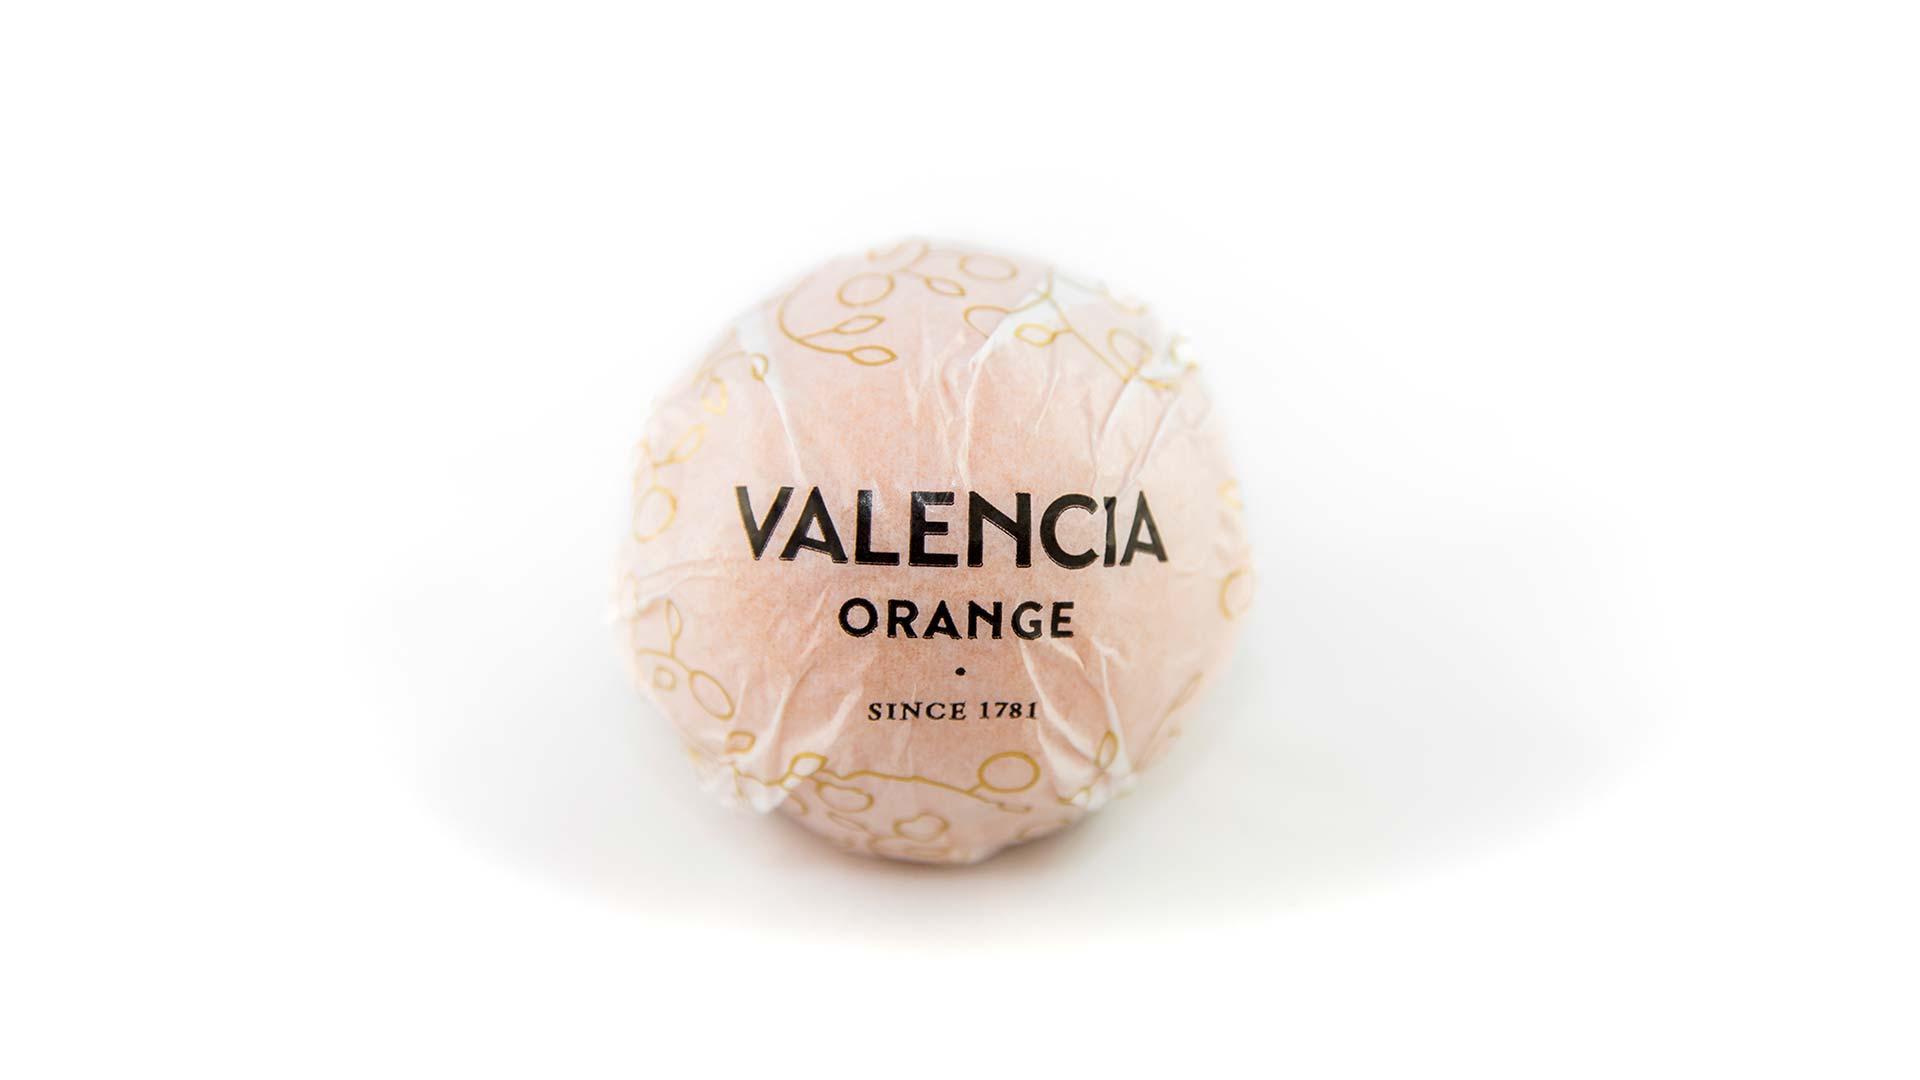 The best orange in the world